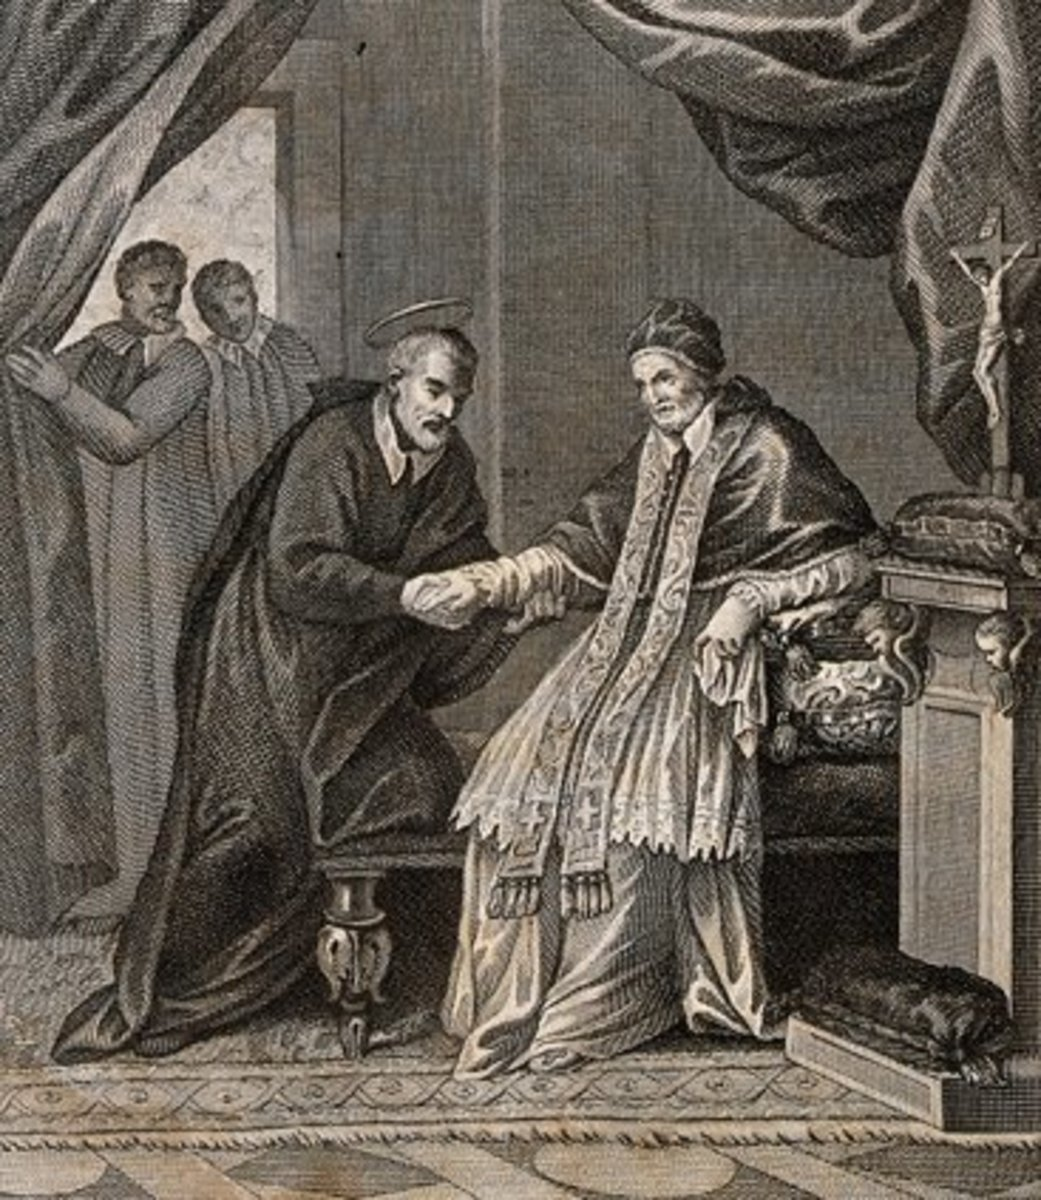 St. Philip heals Pope Clement's gout.